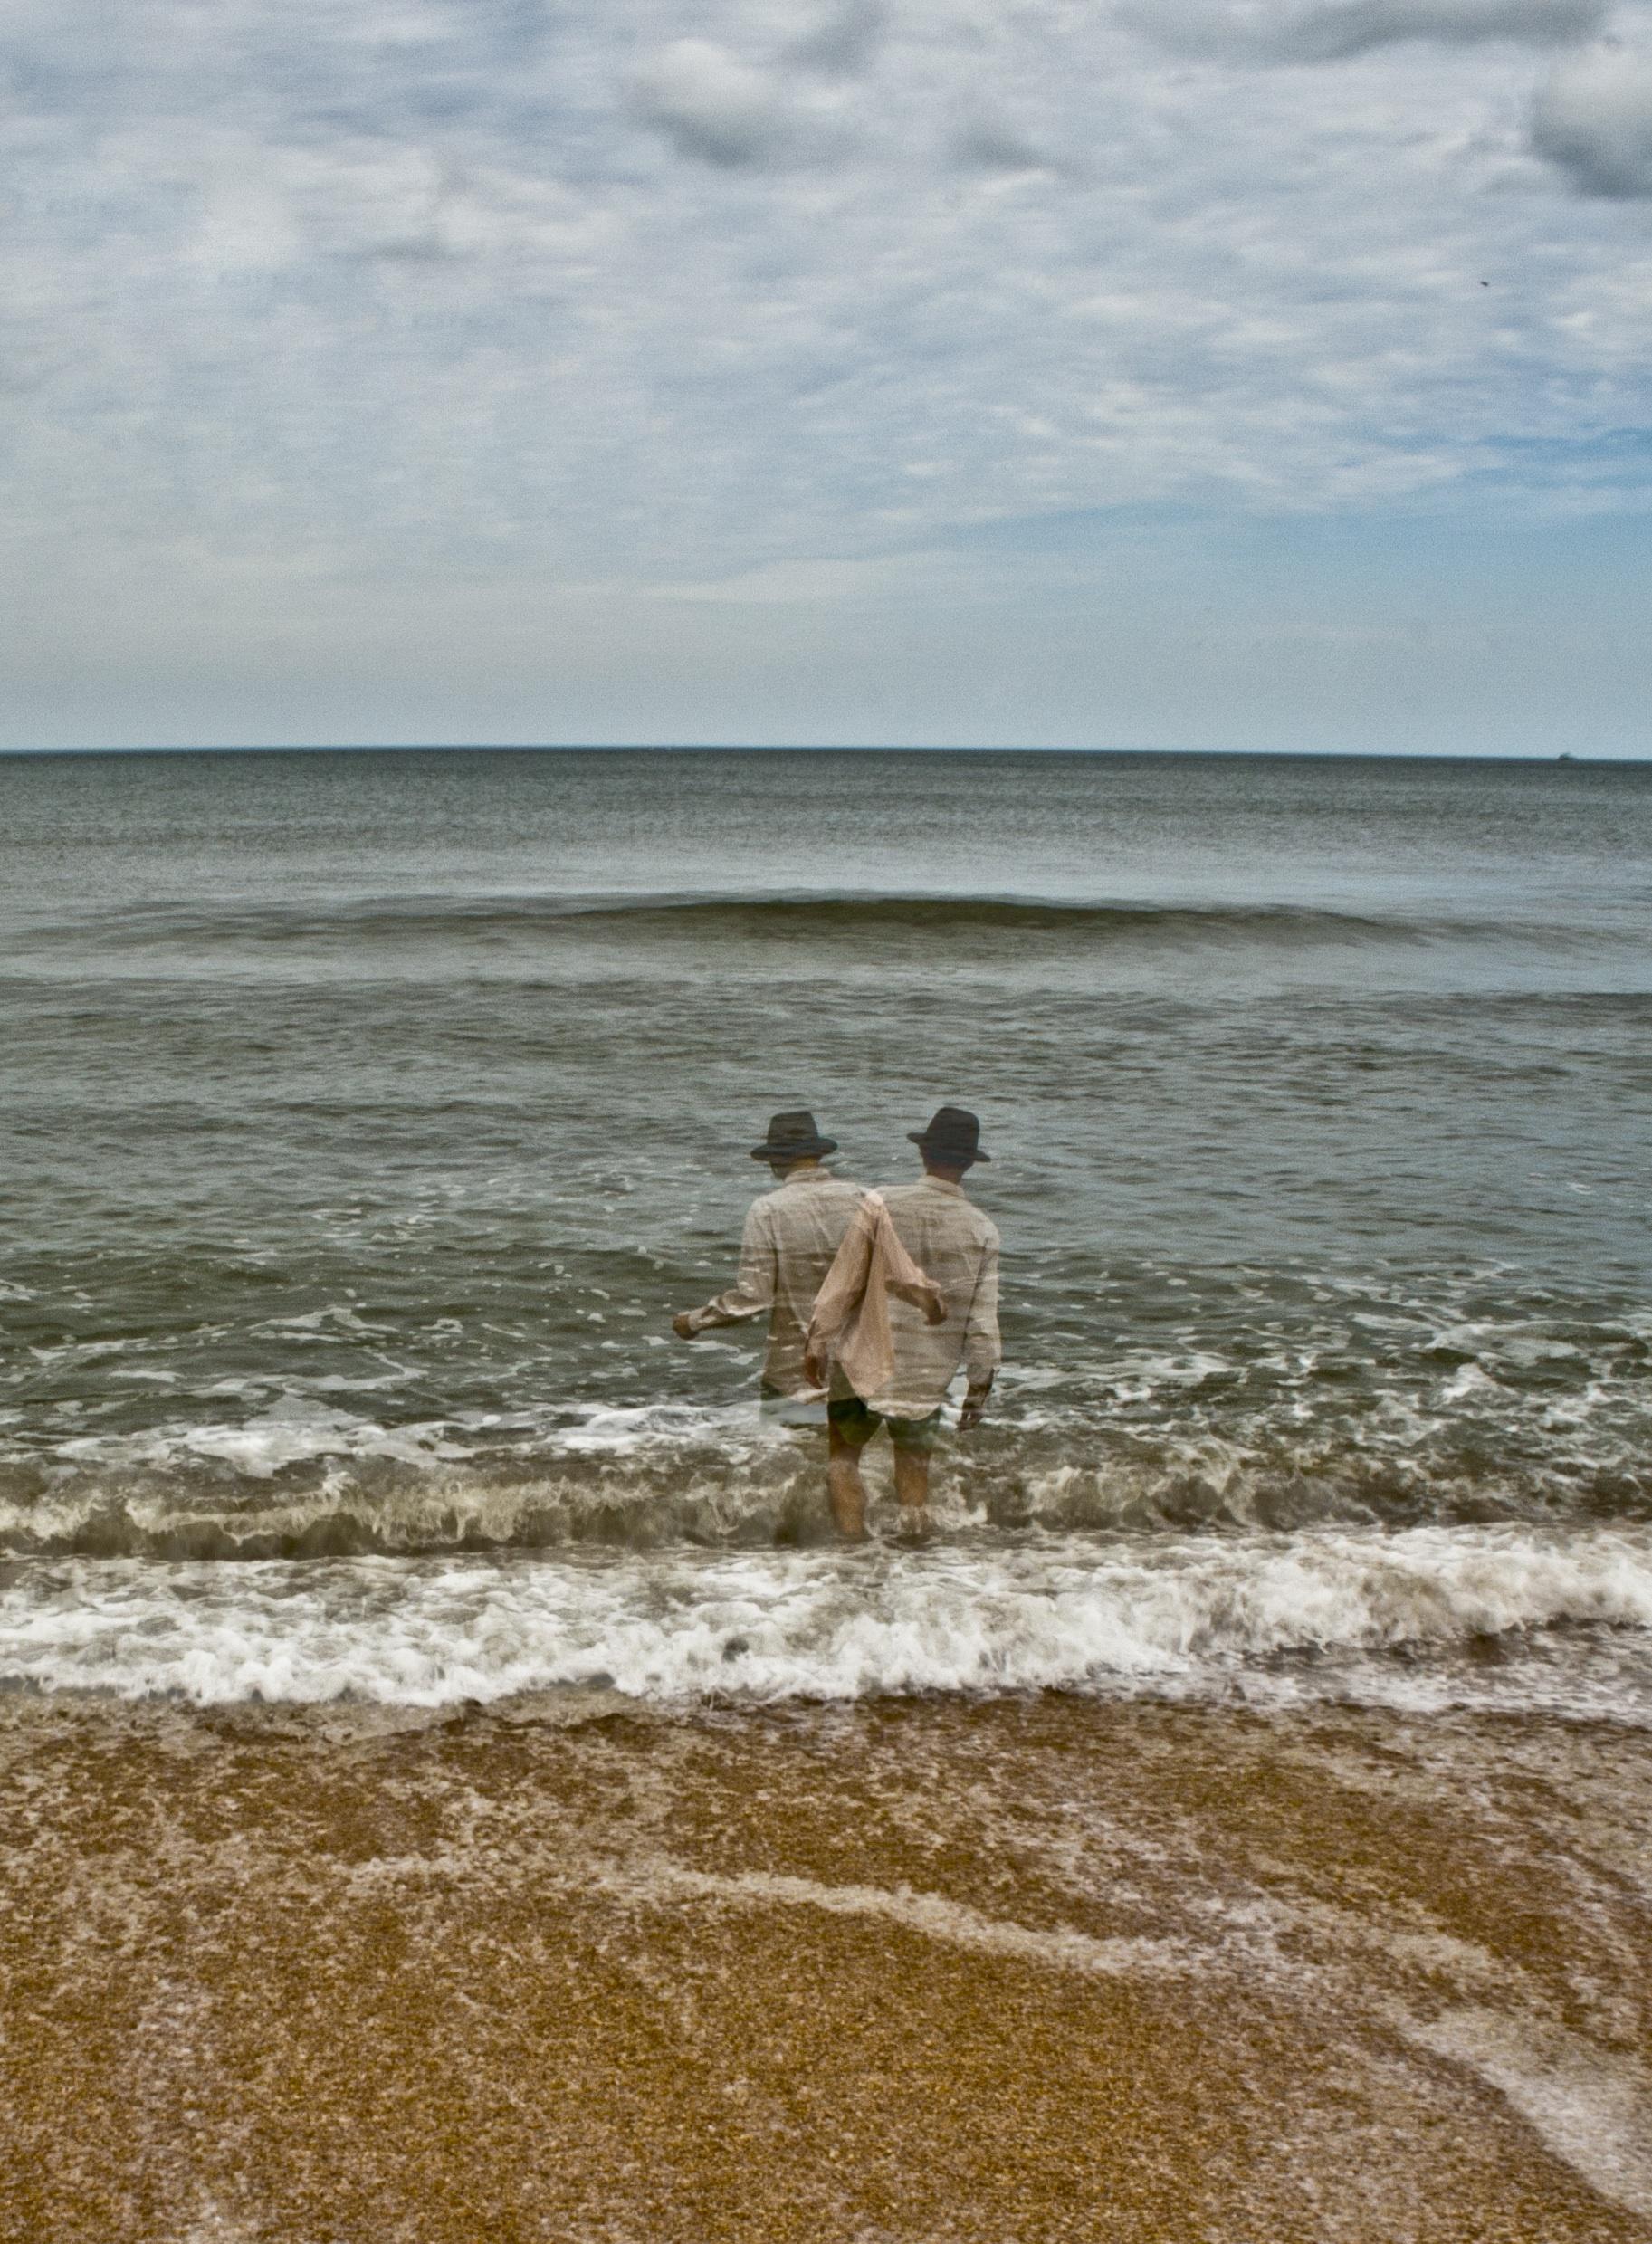 High, Seaside, Water, Shore, Running, HQ Photo